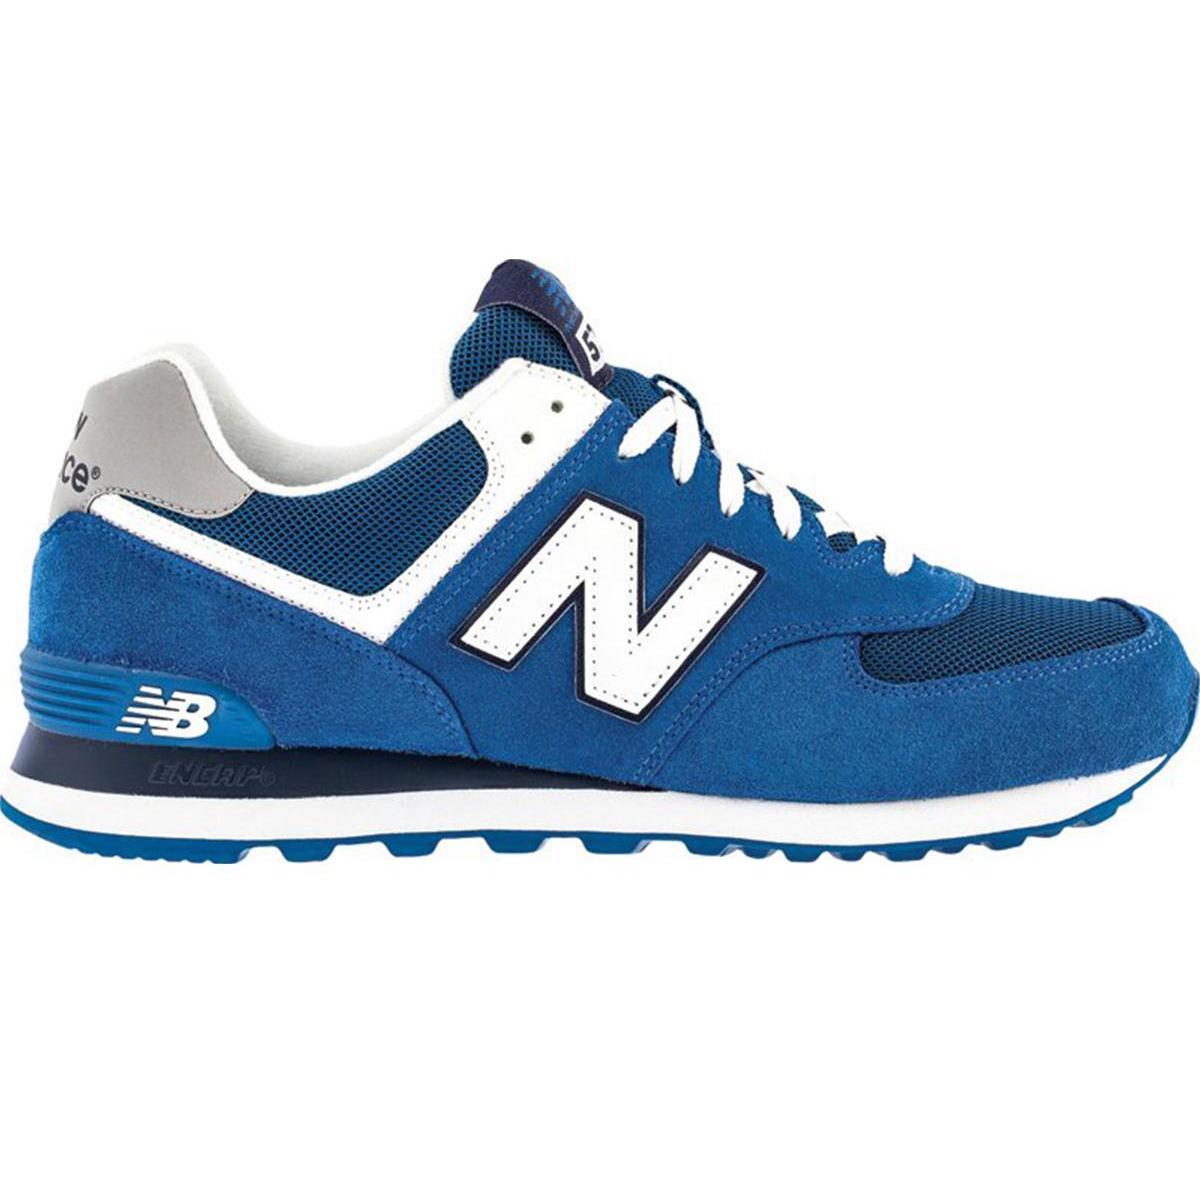 New-Balance-ML-574-Wildleder-Schuhe-Sneaker-Herren-VGN-CPY-NYW-KRW-UR-CPR-VDN